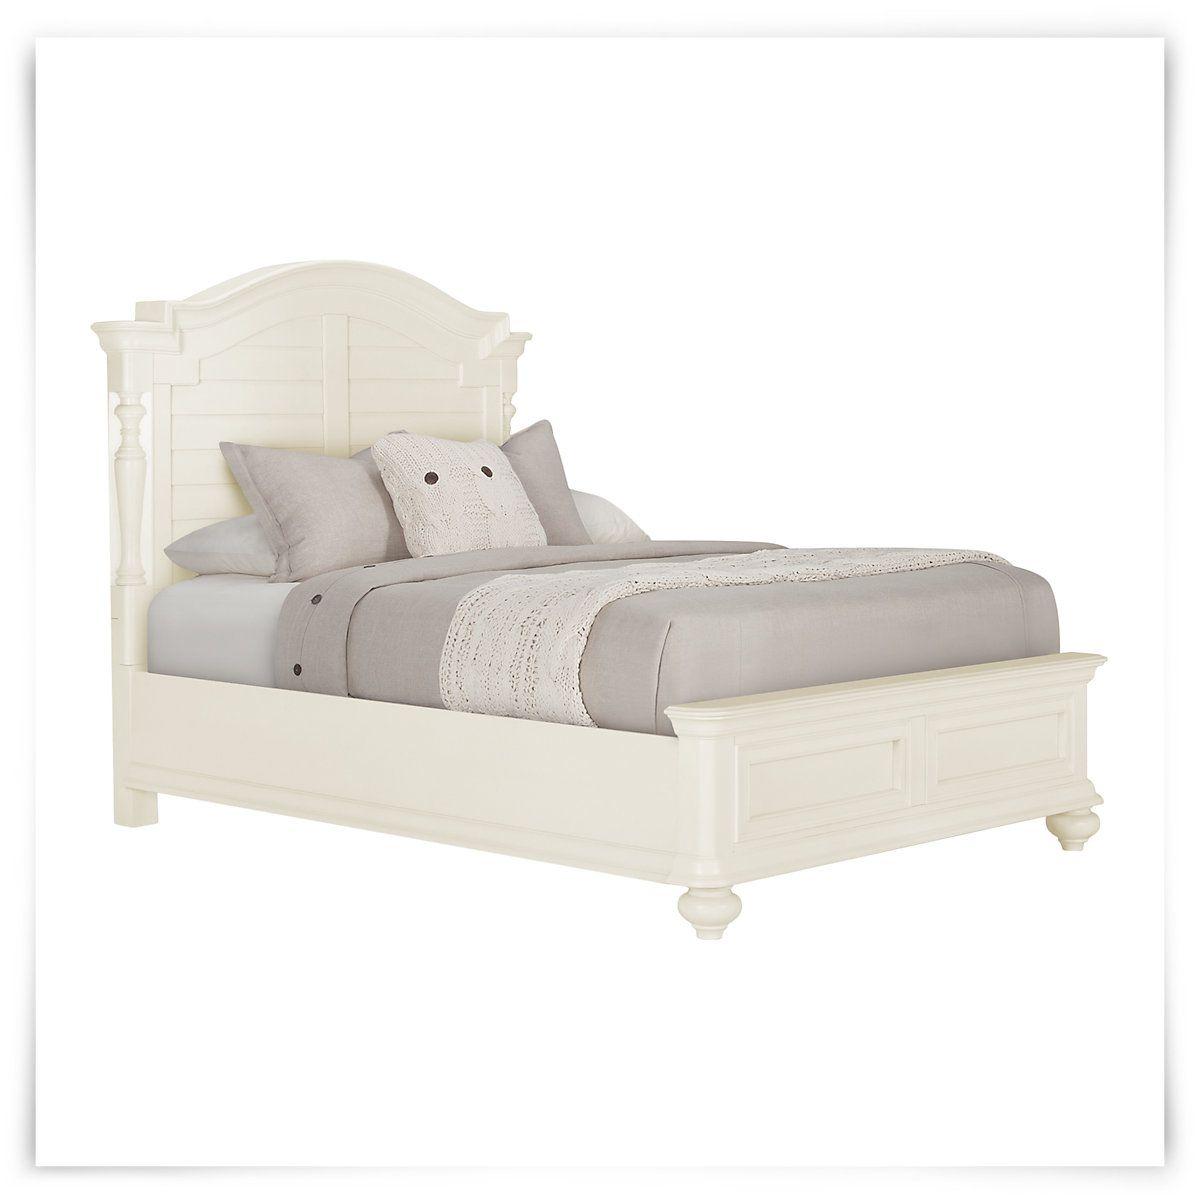 placid cove white panel bed fla master bedroom pinterest